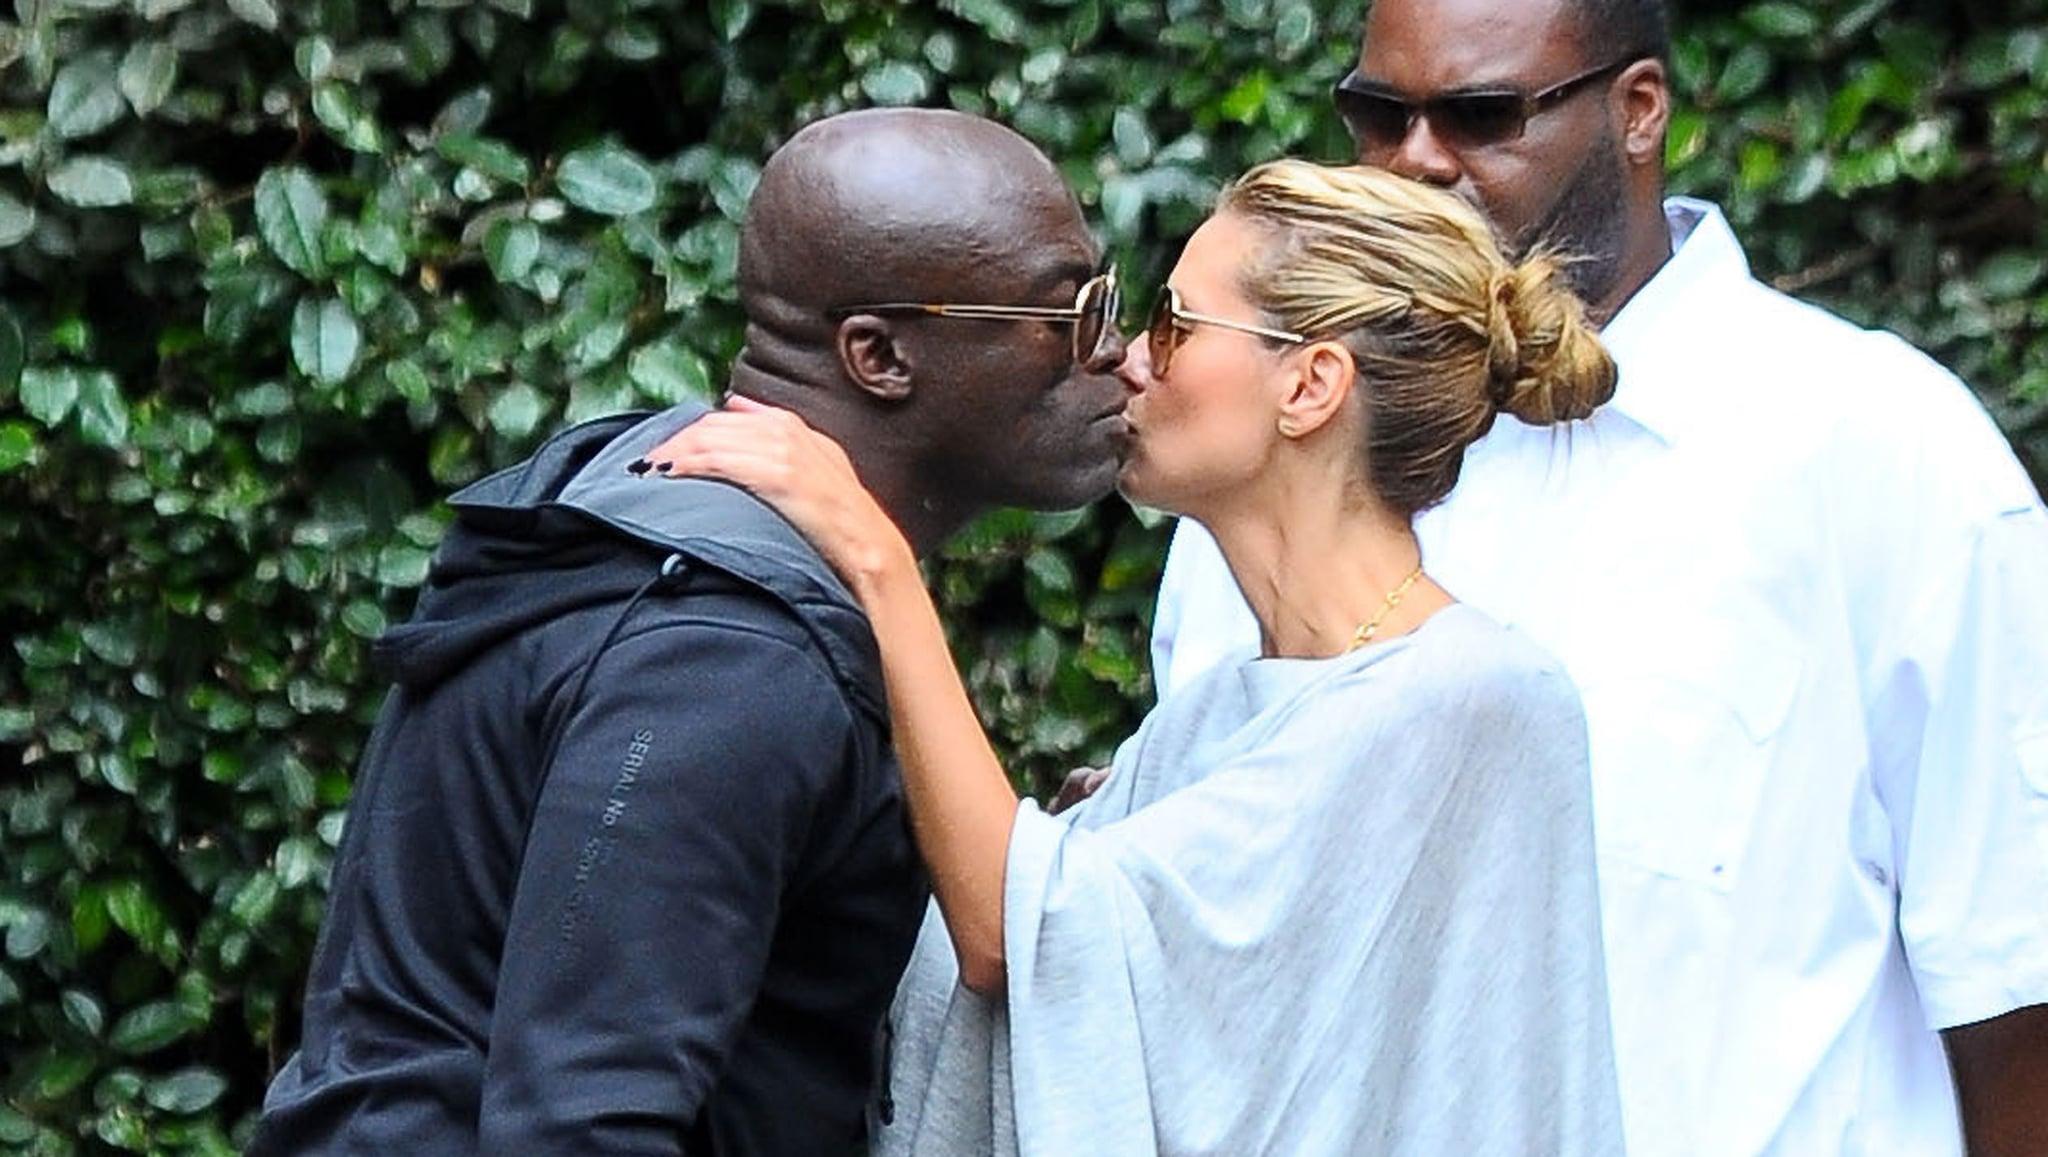 Friendly Exes Heidi Klum and Seal Share a Sweet Kiss